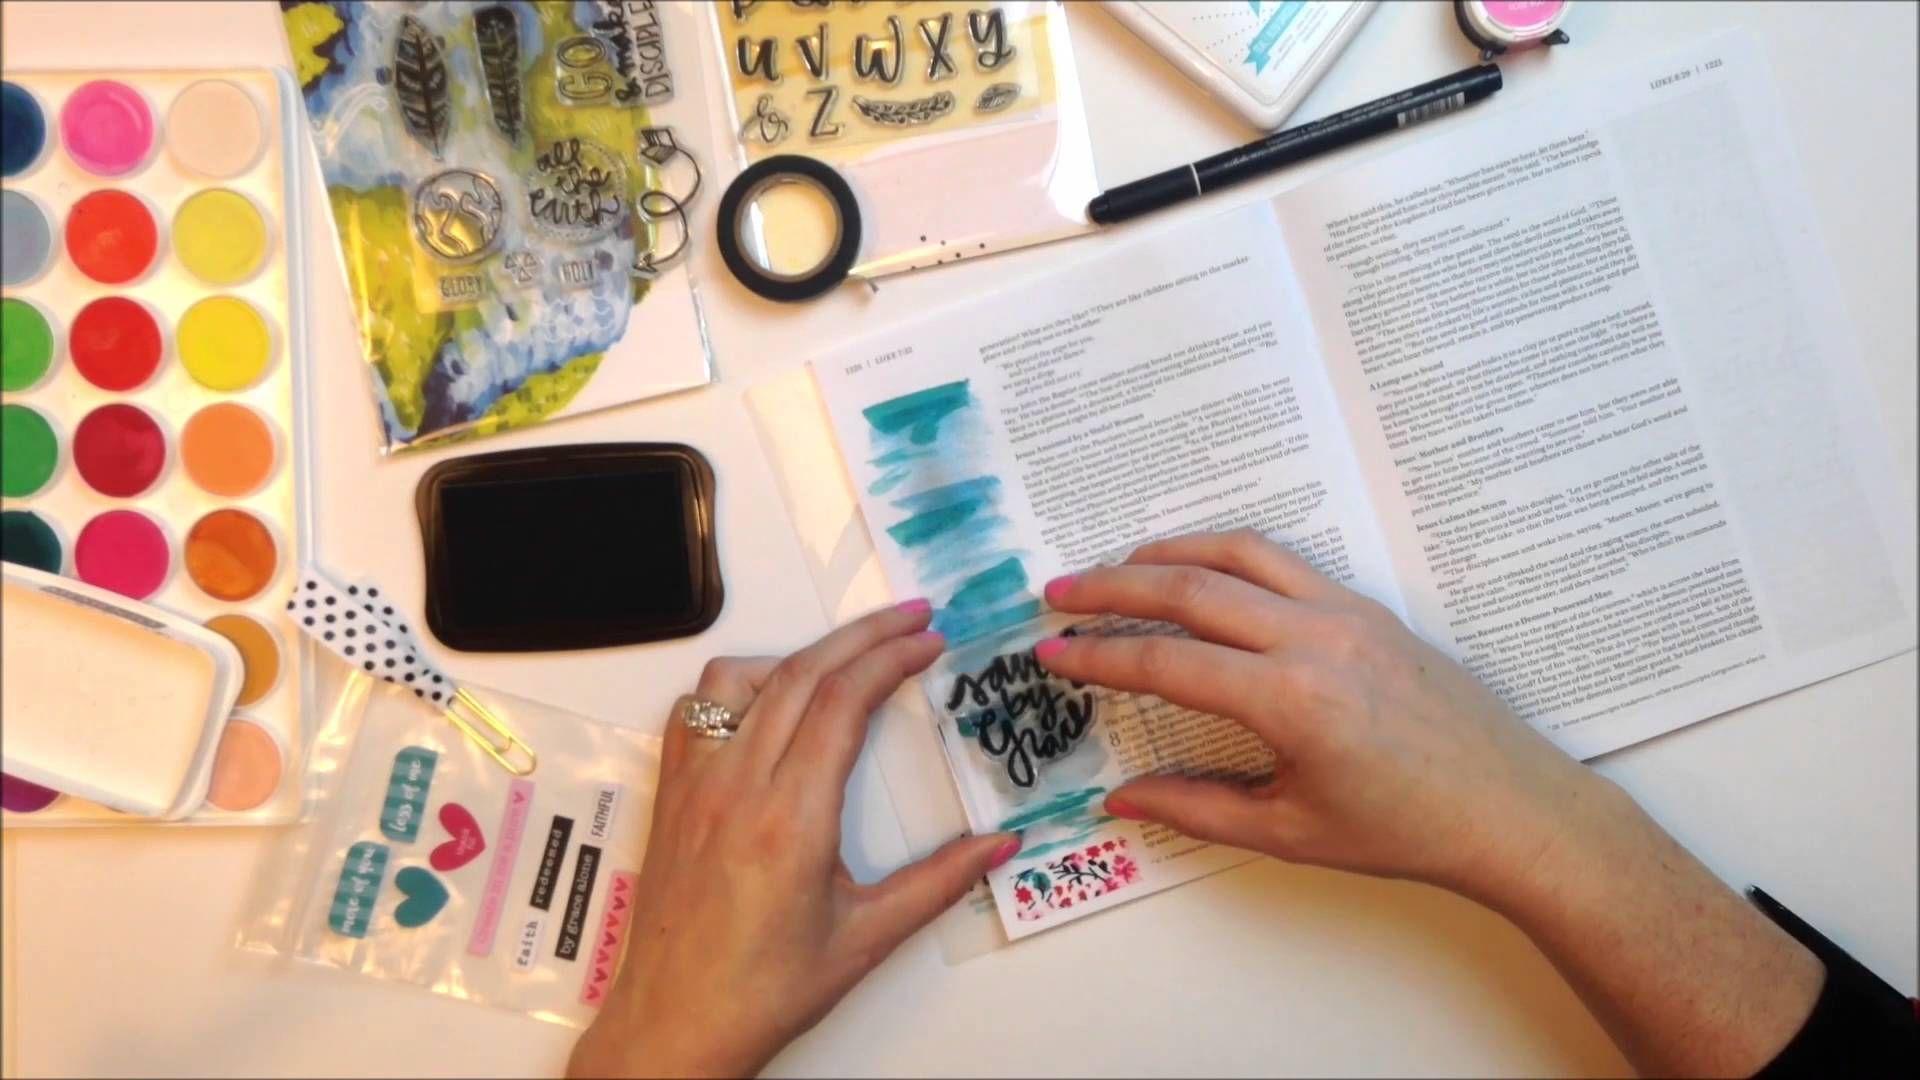 The NIV Beautiful Word Bible (Time Lapse) | DIY | Pinterest ...